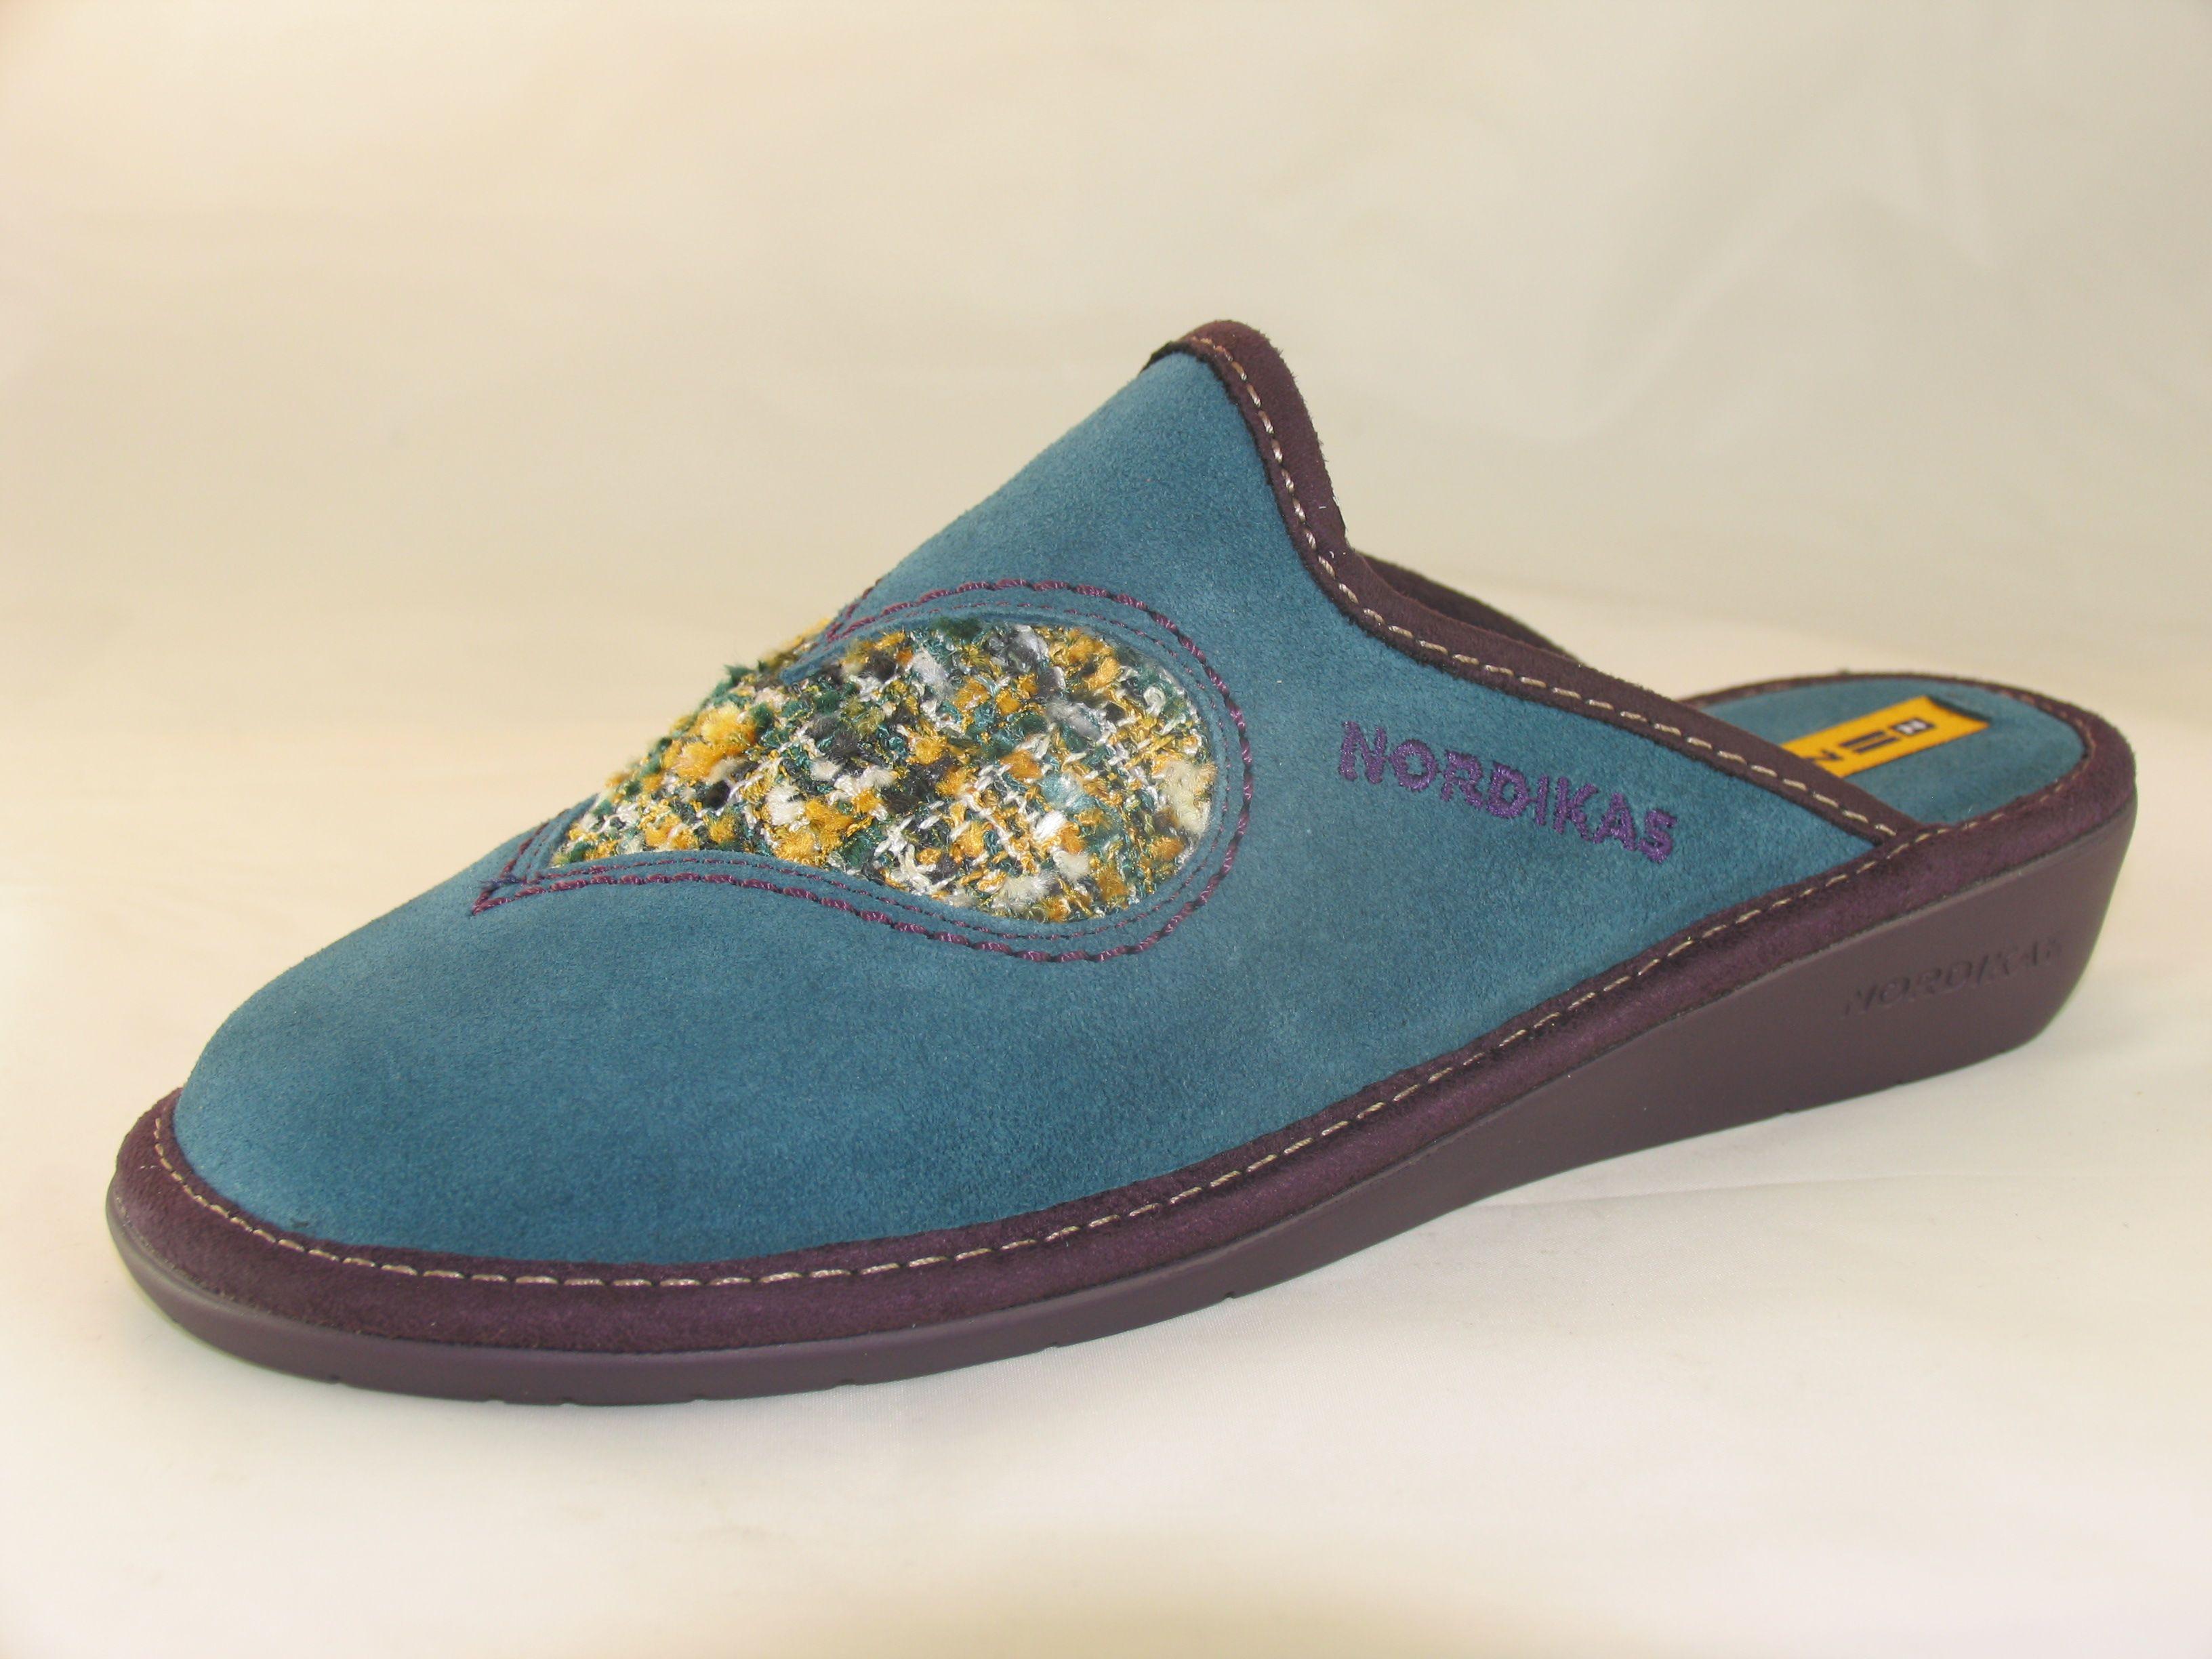 03ad611dc3226 Womens Nordikas 8130 heart motif mule slipper...